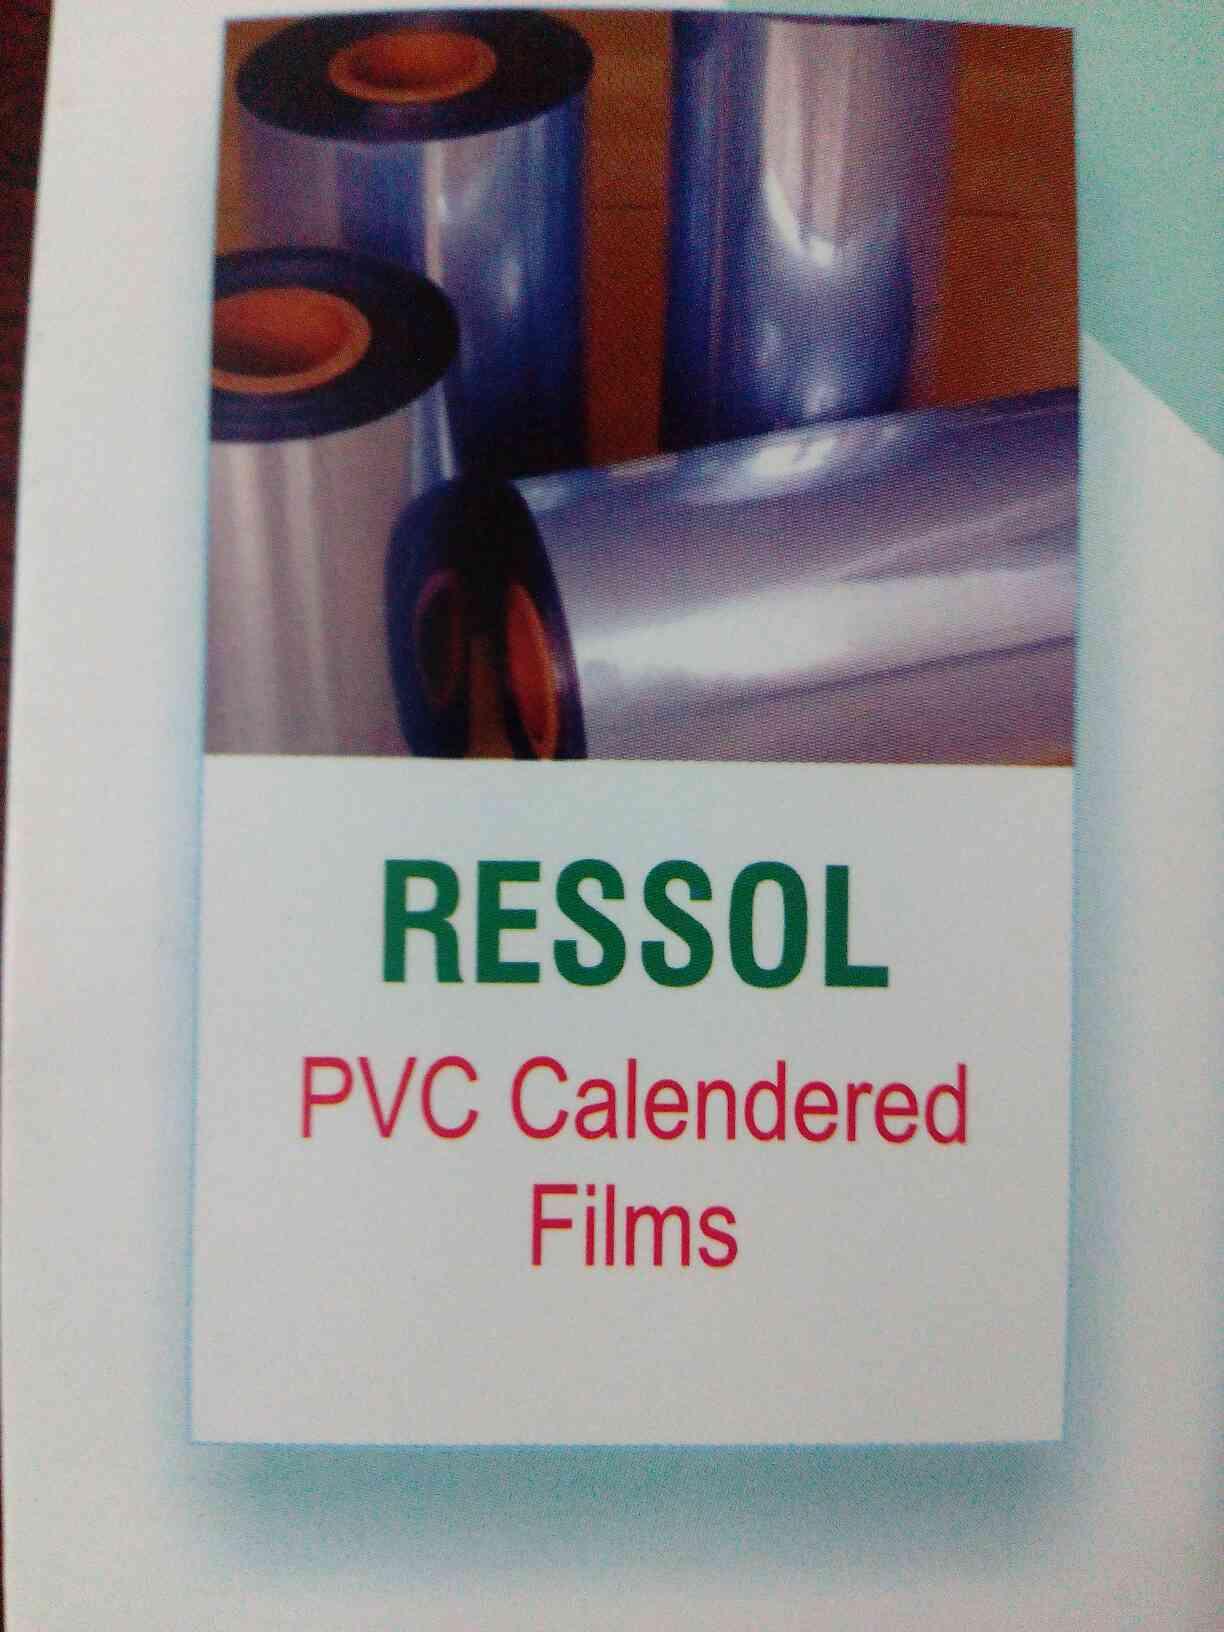 Ressol pvc calenderd films